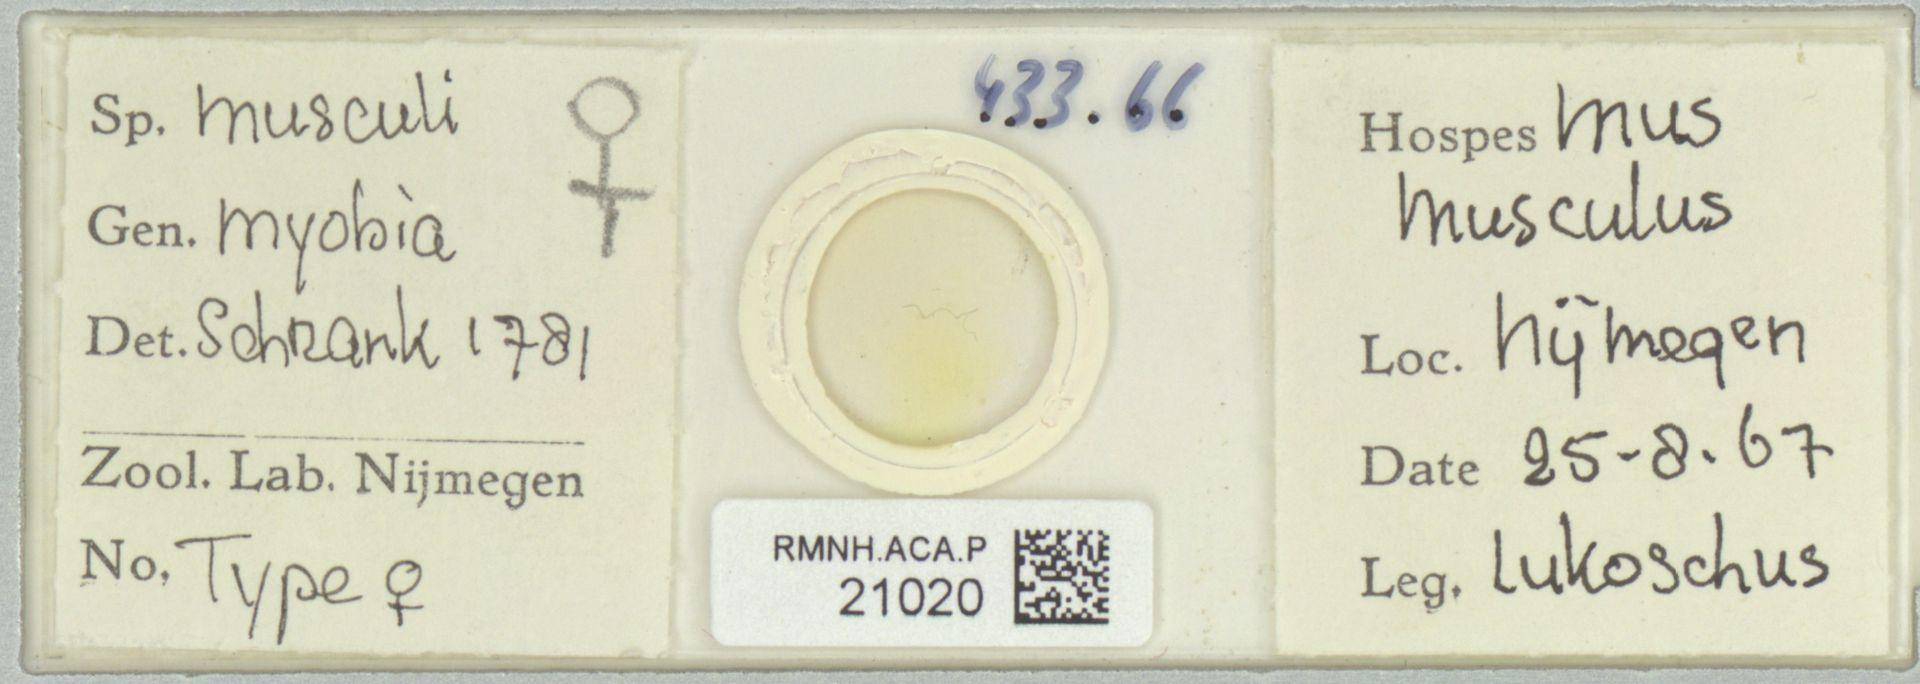 RMNH.ACA.P.21020 | Myobia musculi